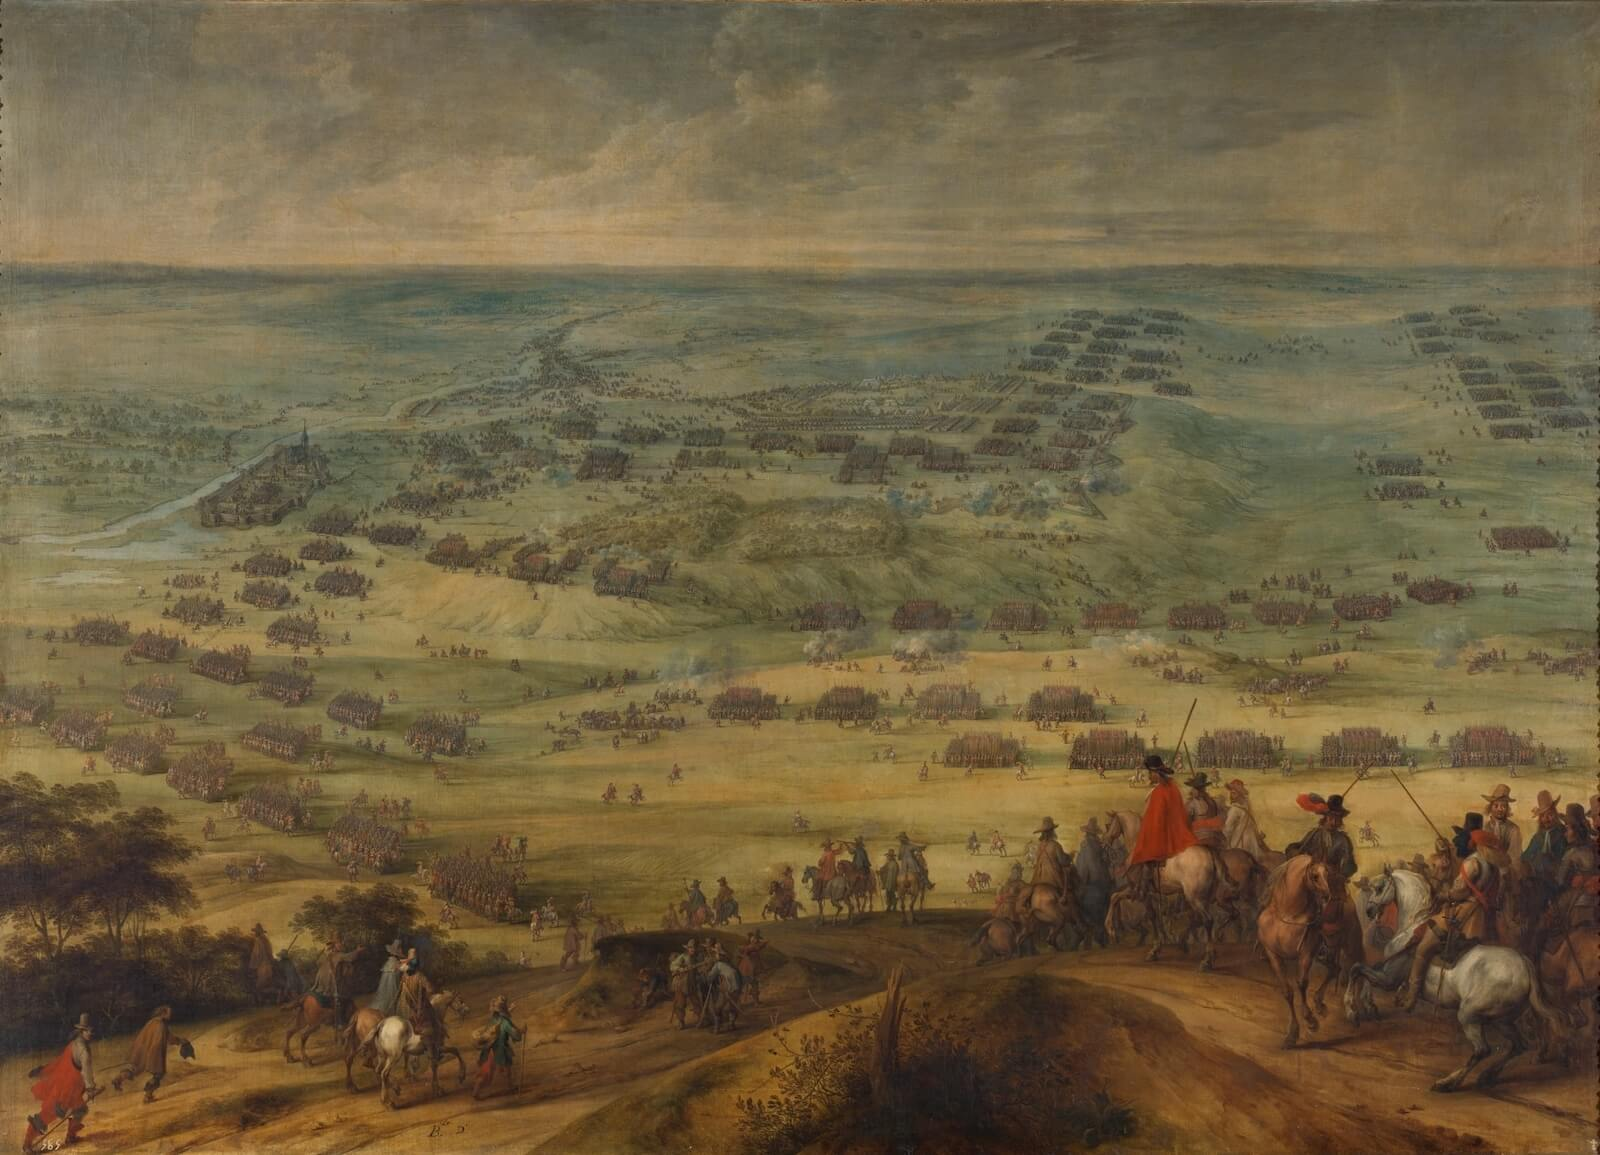 La batalla de Honnecourt Pieter Snayers